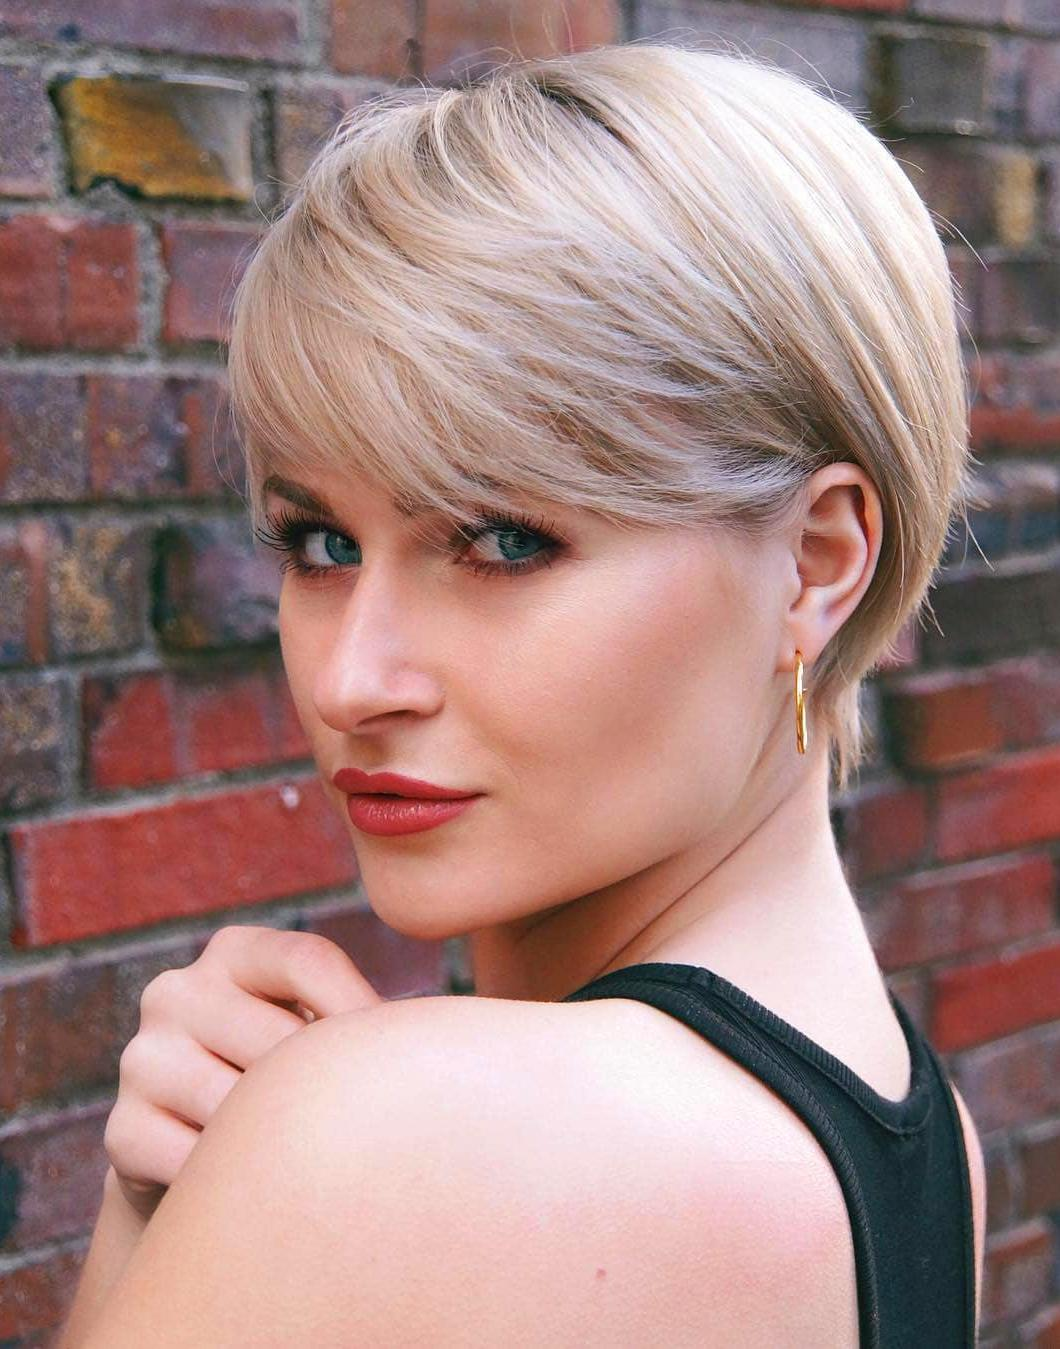 80 Trendy Short Pixie Hairstyles For Women